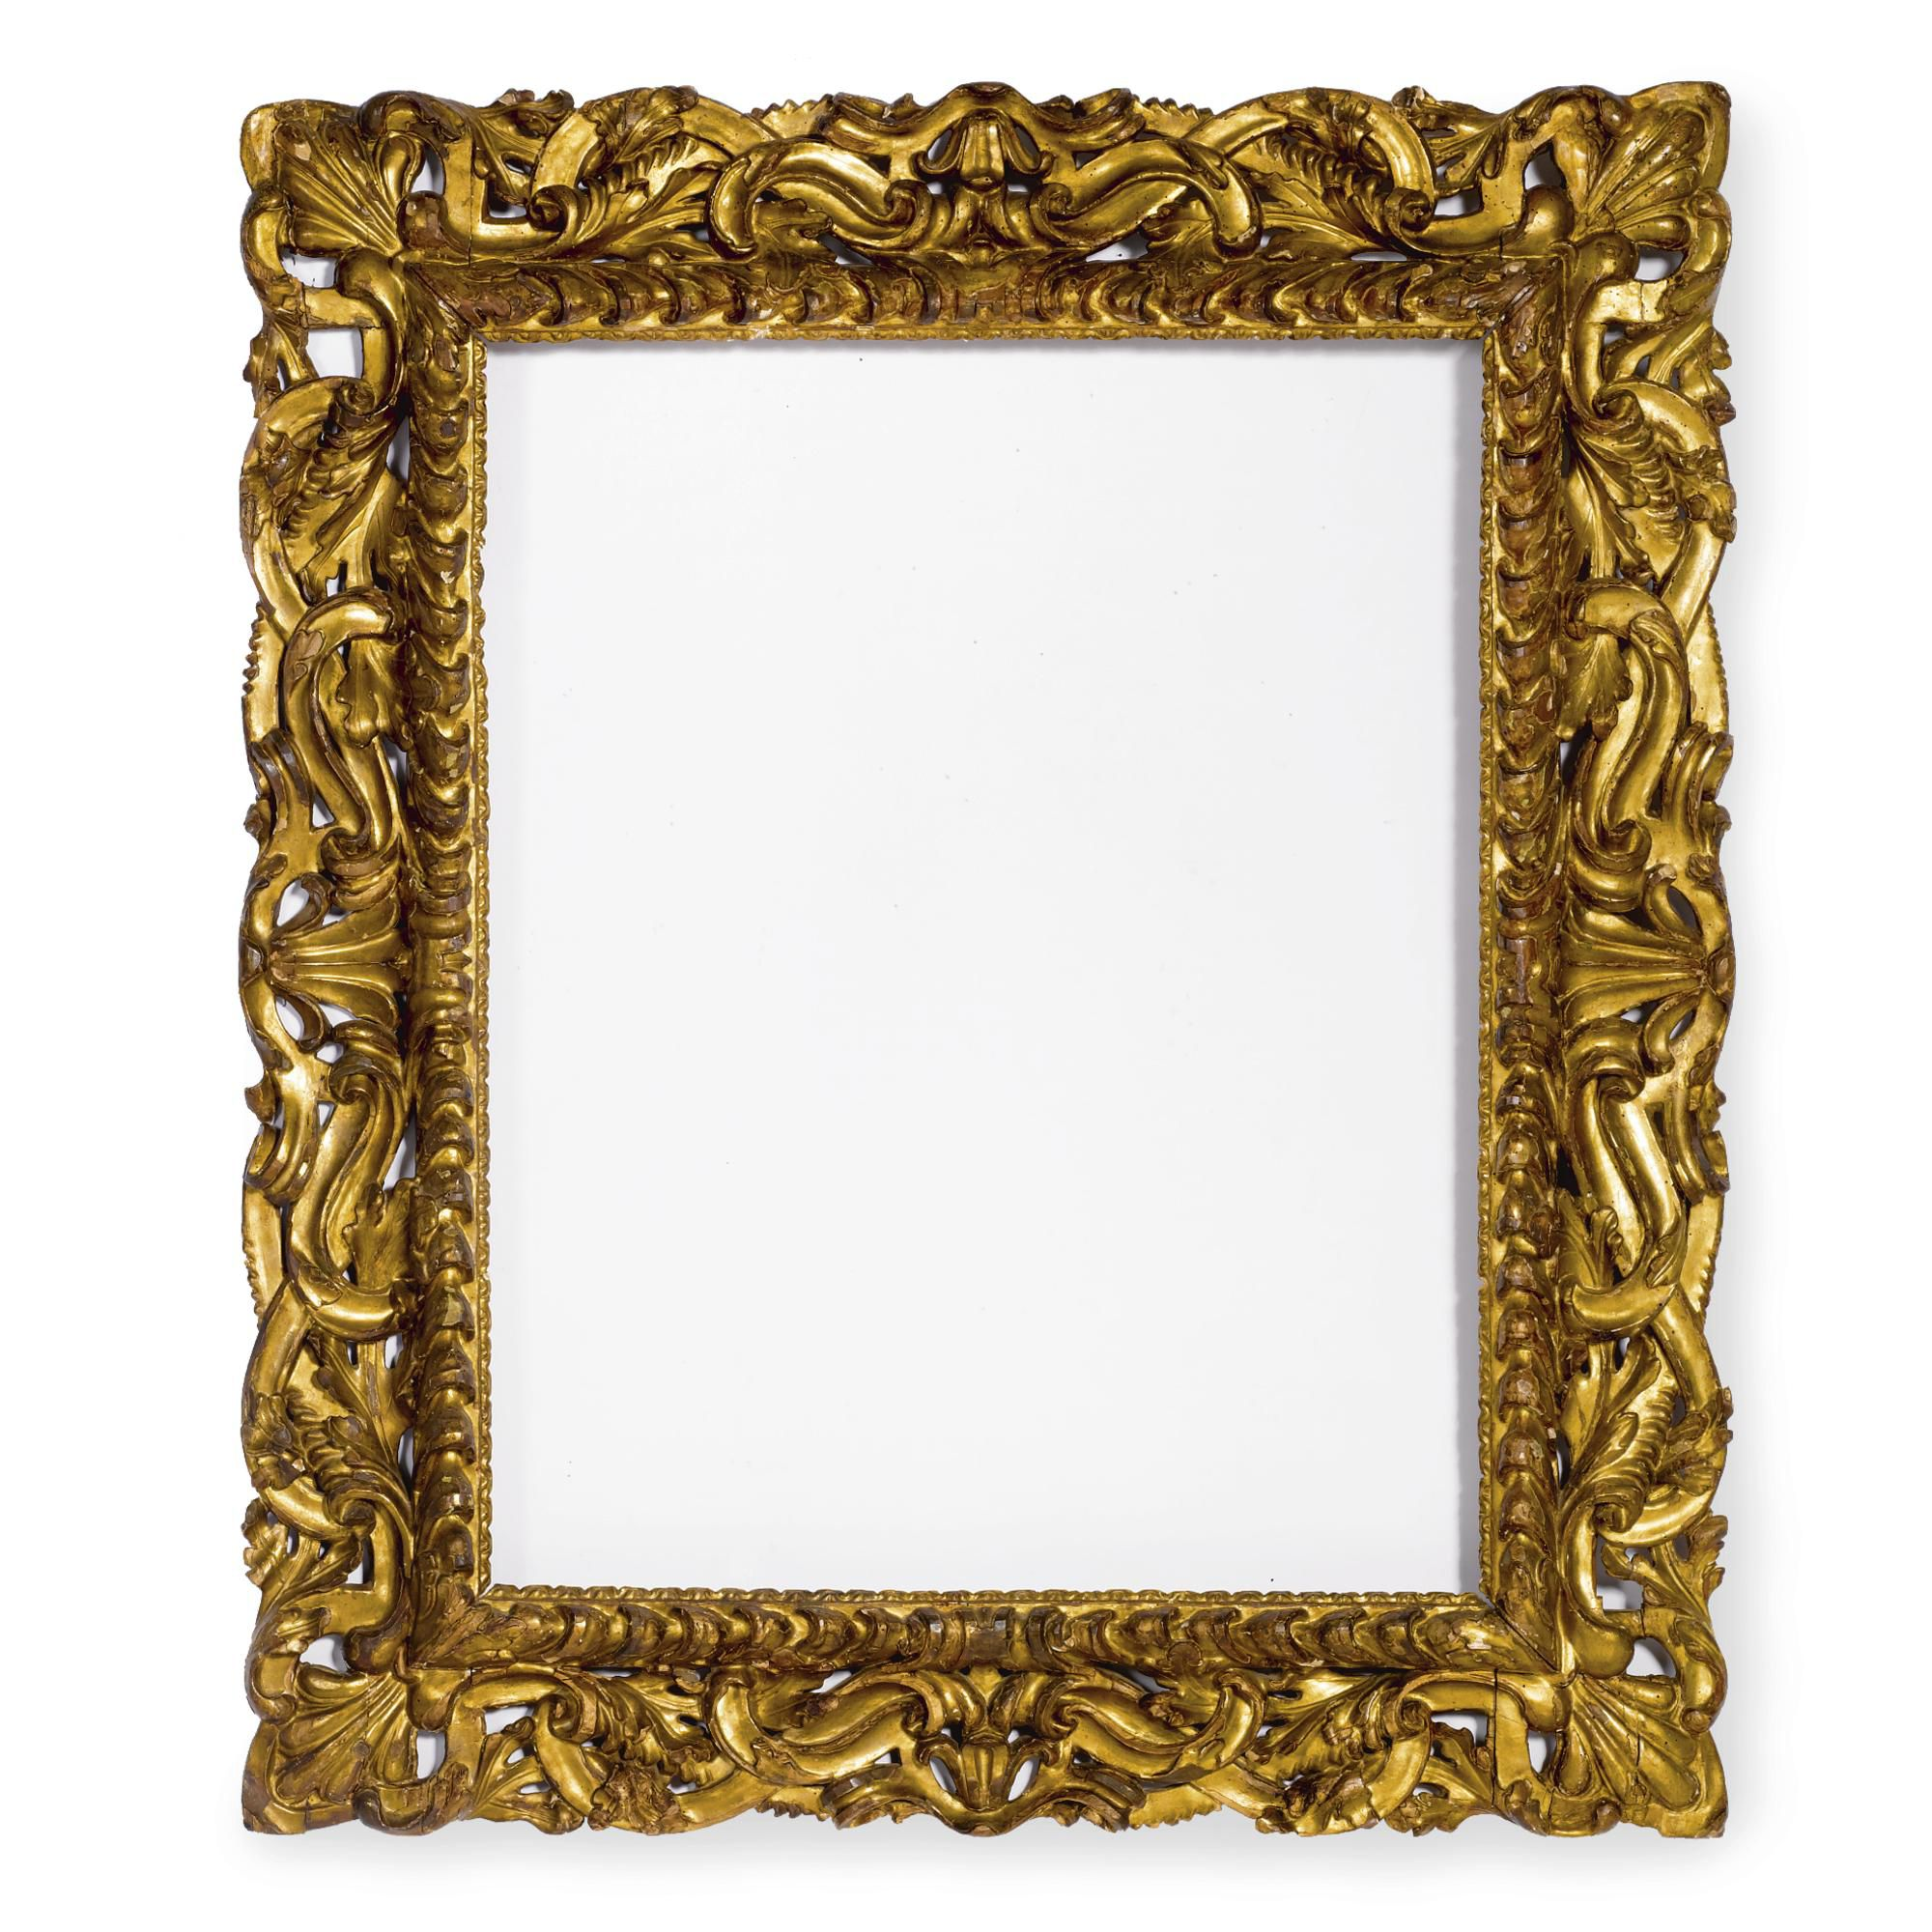 Italian Baroque Giltwood Frame Florence 17th Century